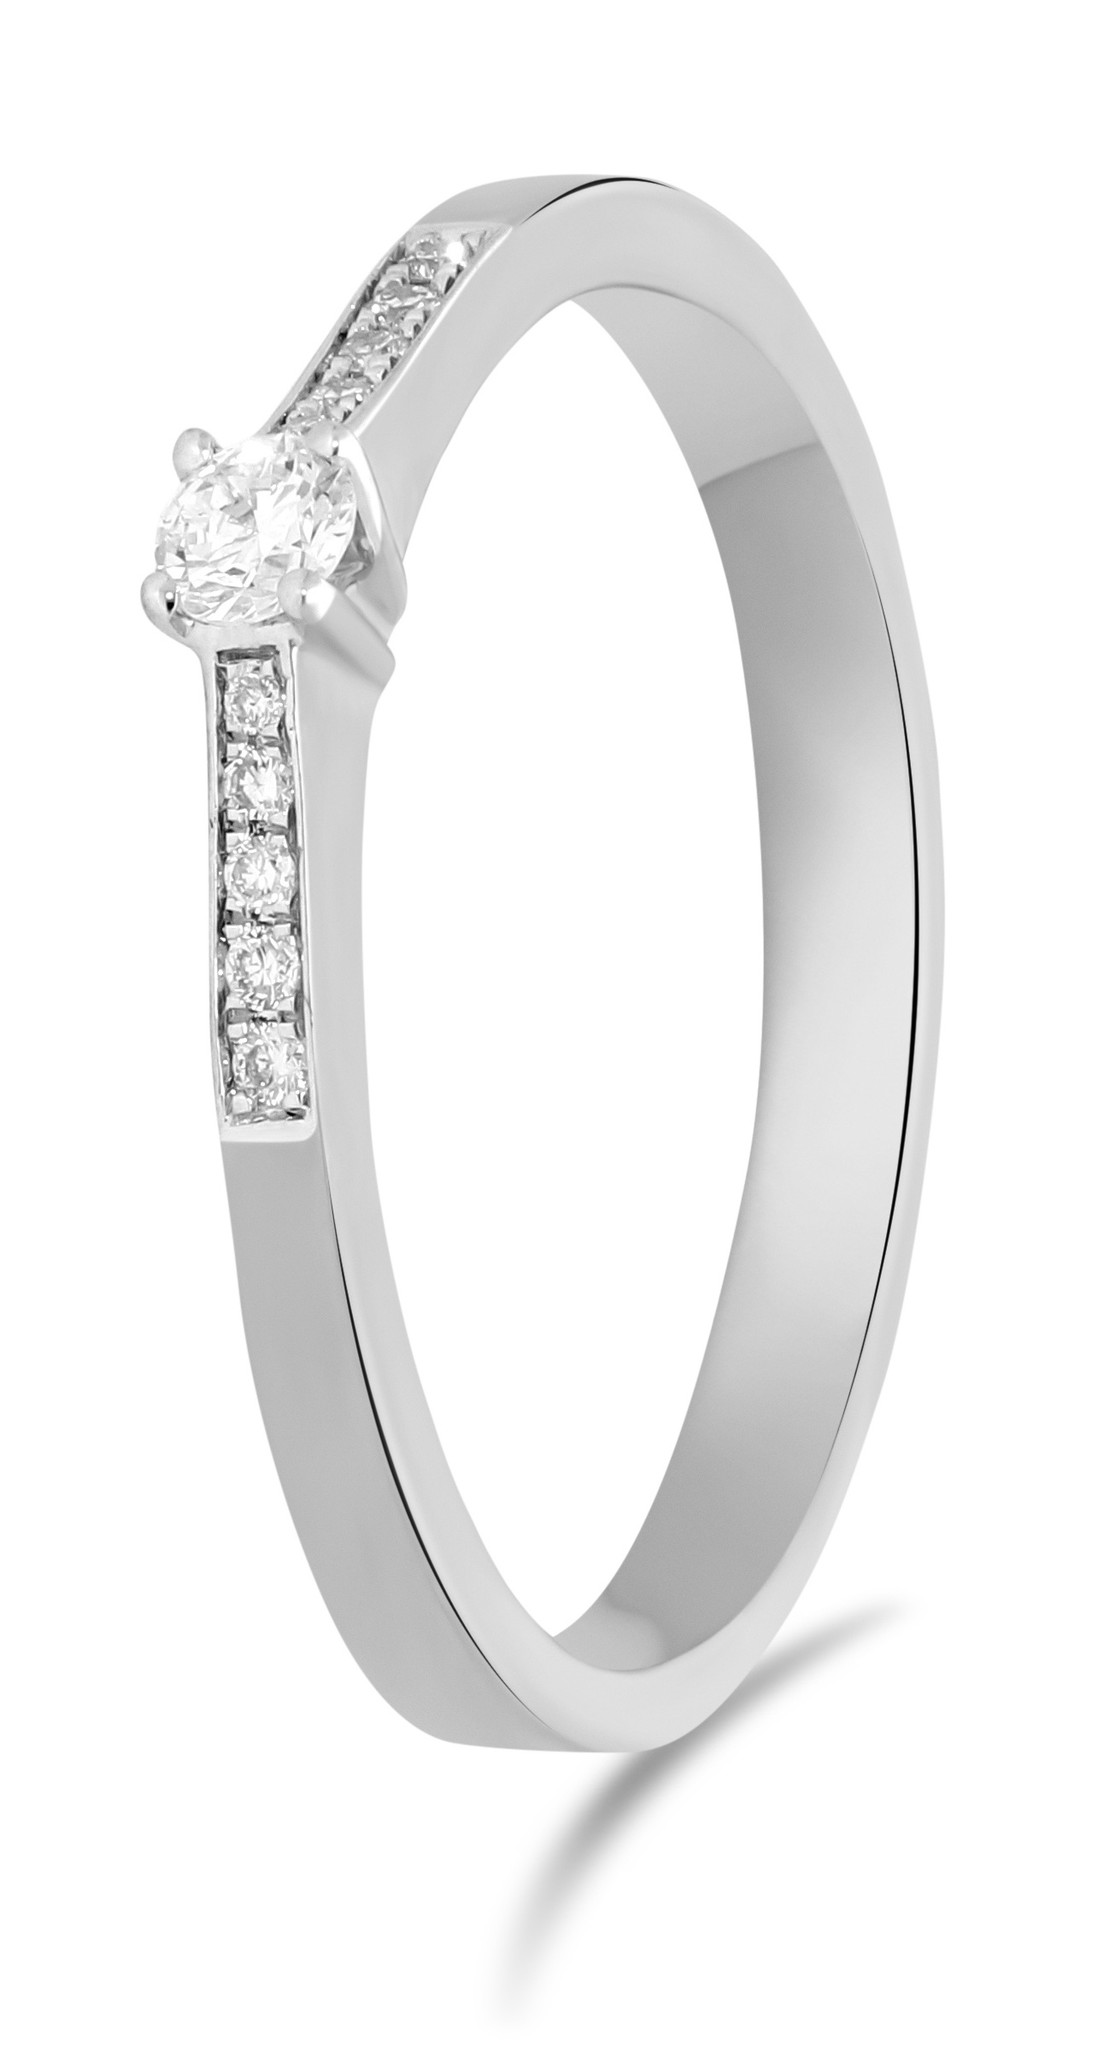 14 karaat witgouden ring met diamant 0.05 crt. - Solitair - Witgoud-1